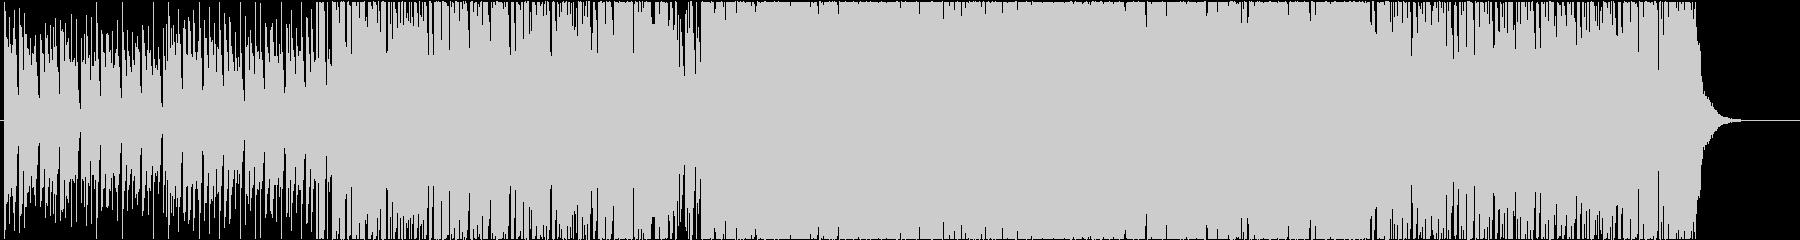 Tabooの未再生の波形